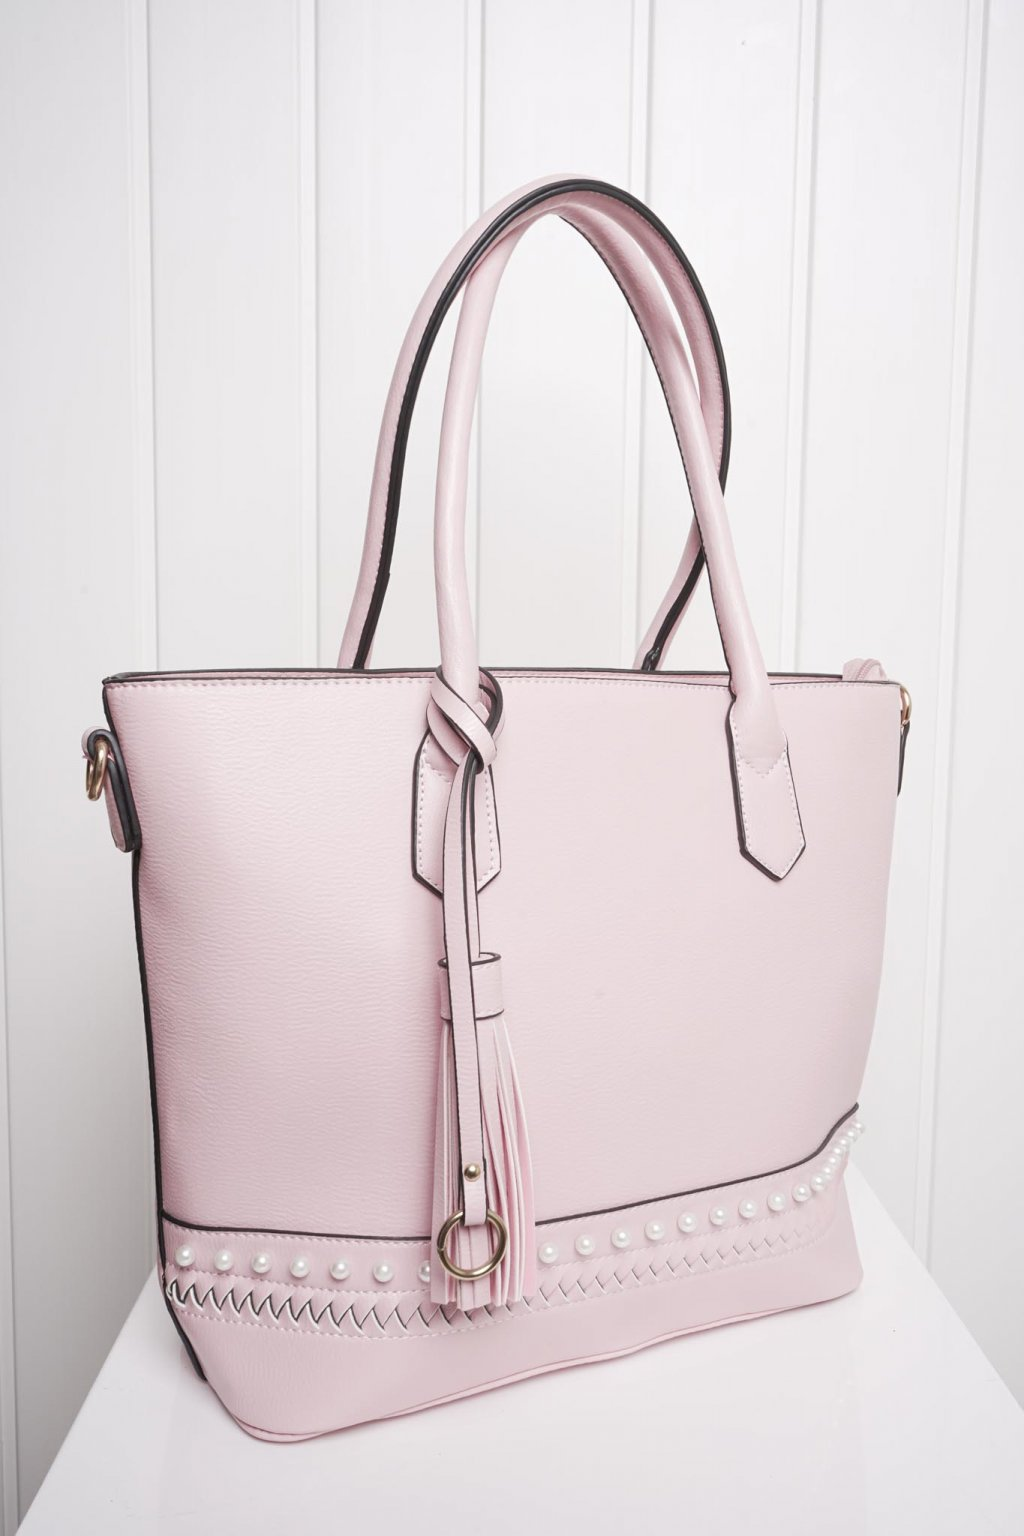 Kabelka, ruksak, dobrá cena, čierna kabelka, čierny ruksak, basic, kabelky, ruksaky 131